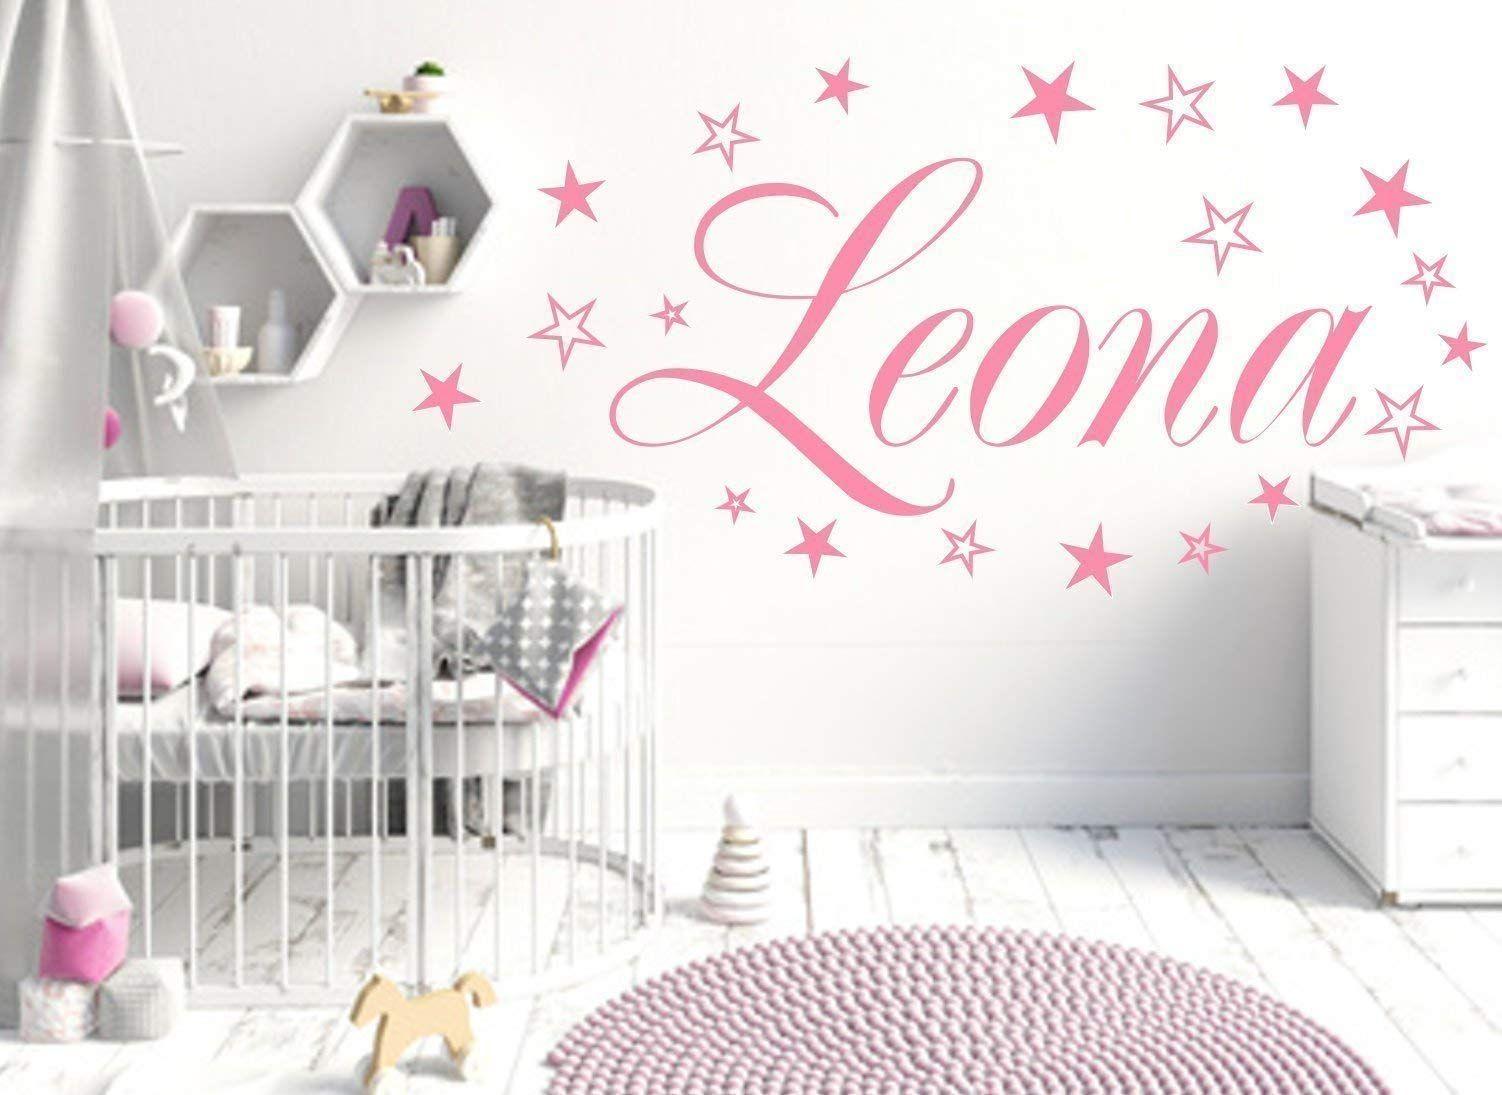 Wandtattoos Wandbilder Schmetterlingen Sternen Baby Persoalisiert Wandtattoo Kinderzimmer Namen M Mobel Wohnen Elin Pens Ac Id